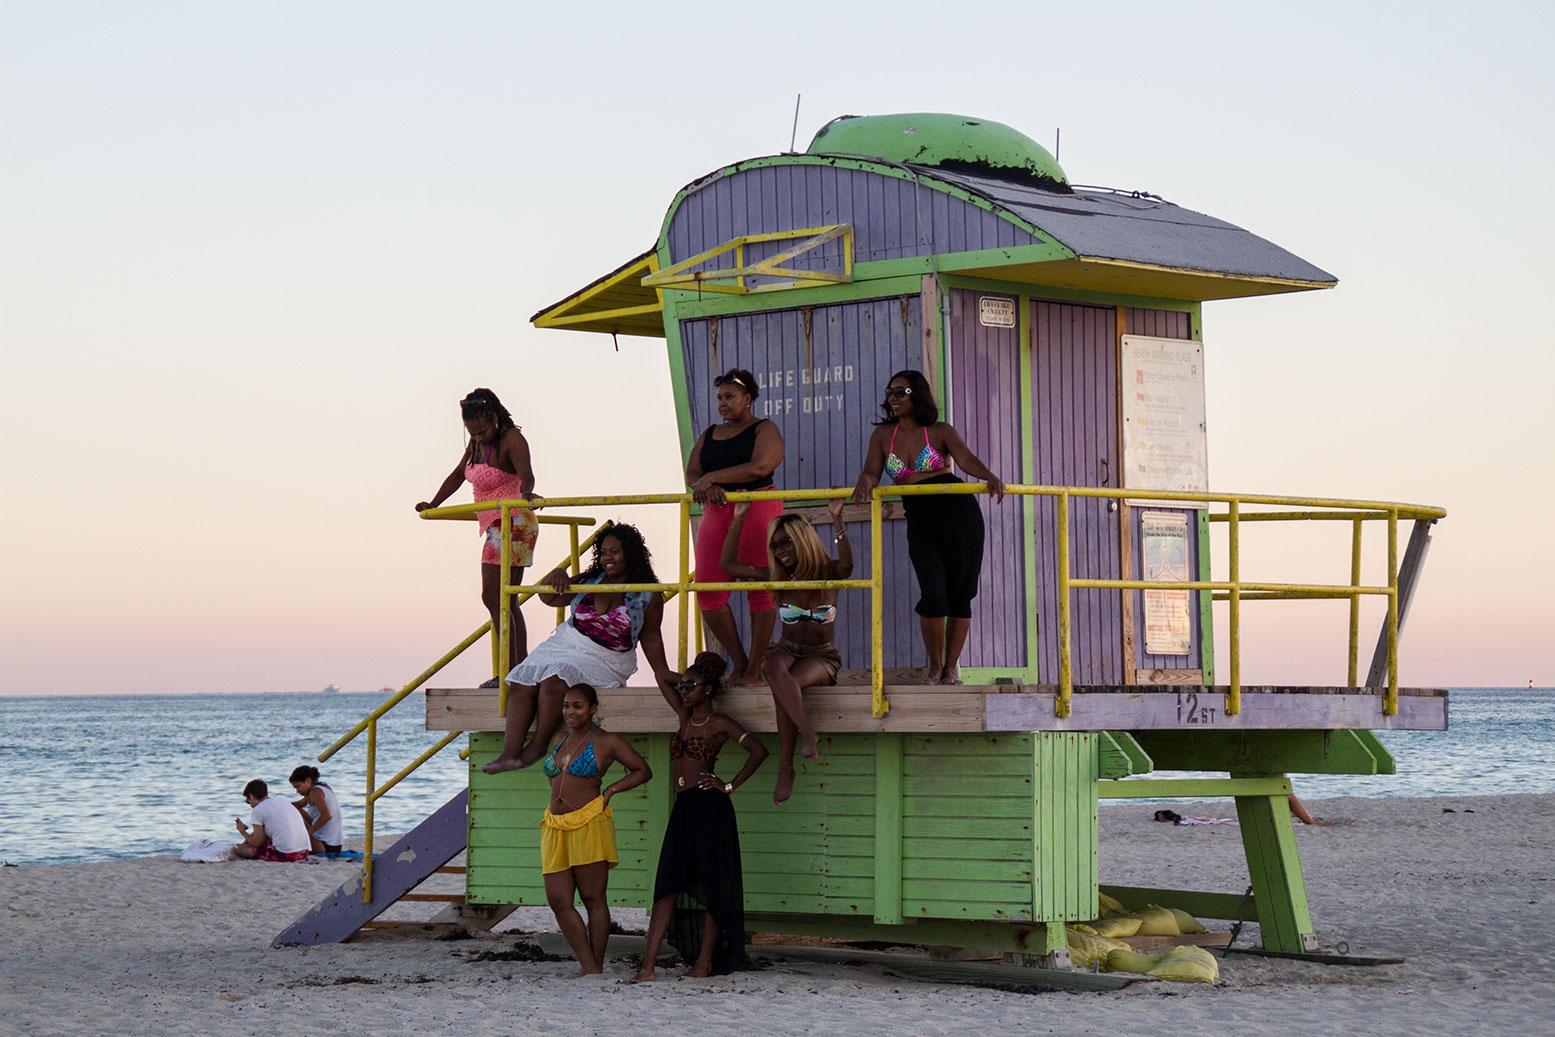 public-art-basel-miami-beach-fair-usa-florida-guardians-of-time-manfred-kili-kielnhofer-contemporary-fine-art-modern-arts-design-antiques-sculpture-7508